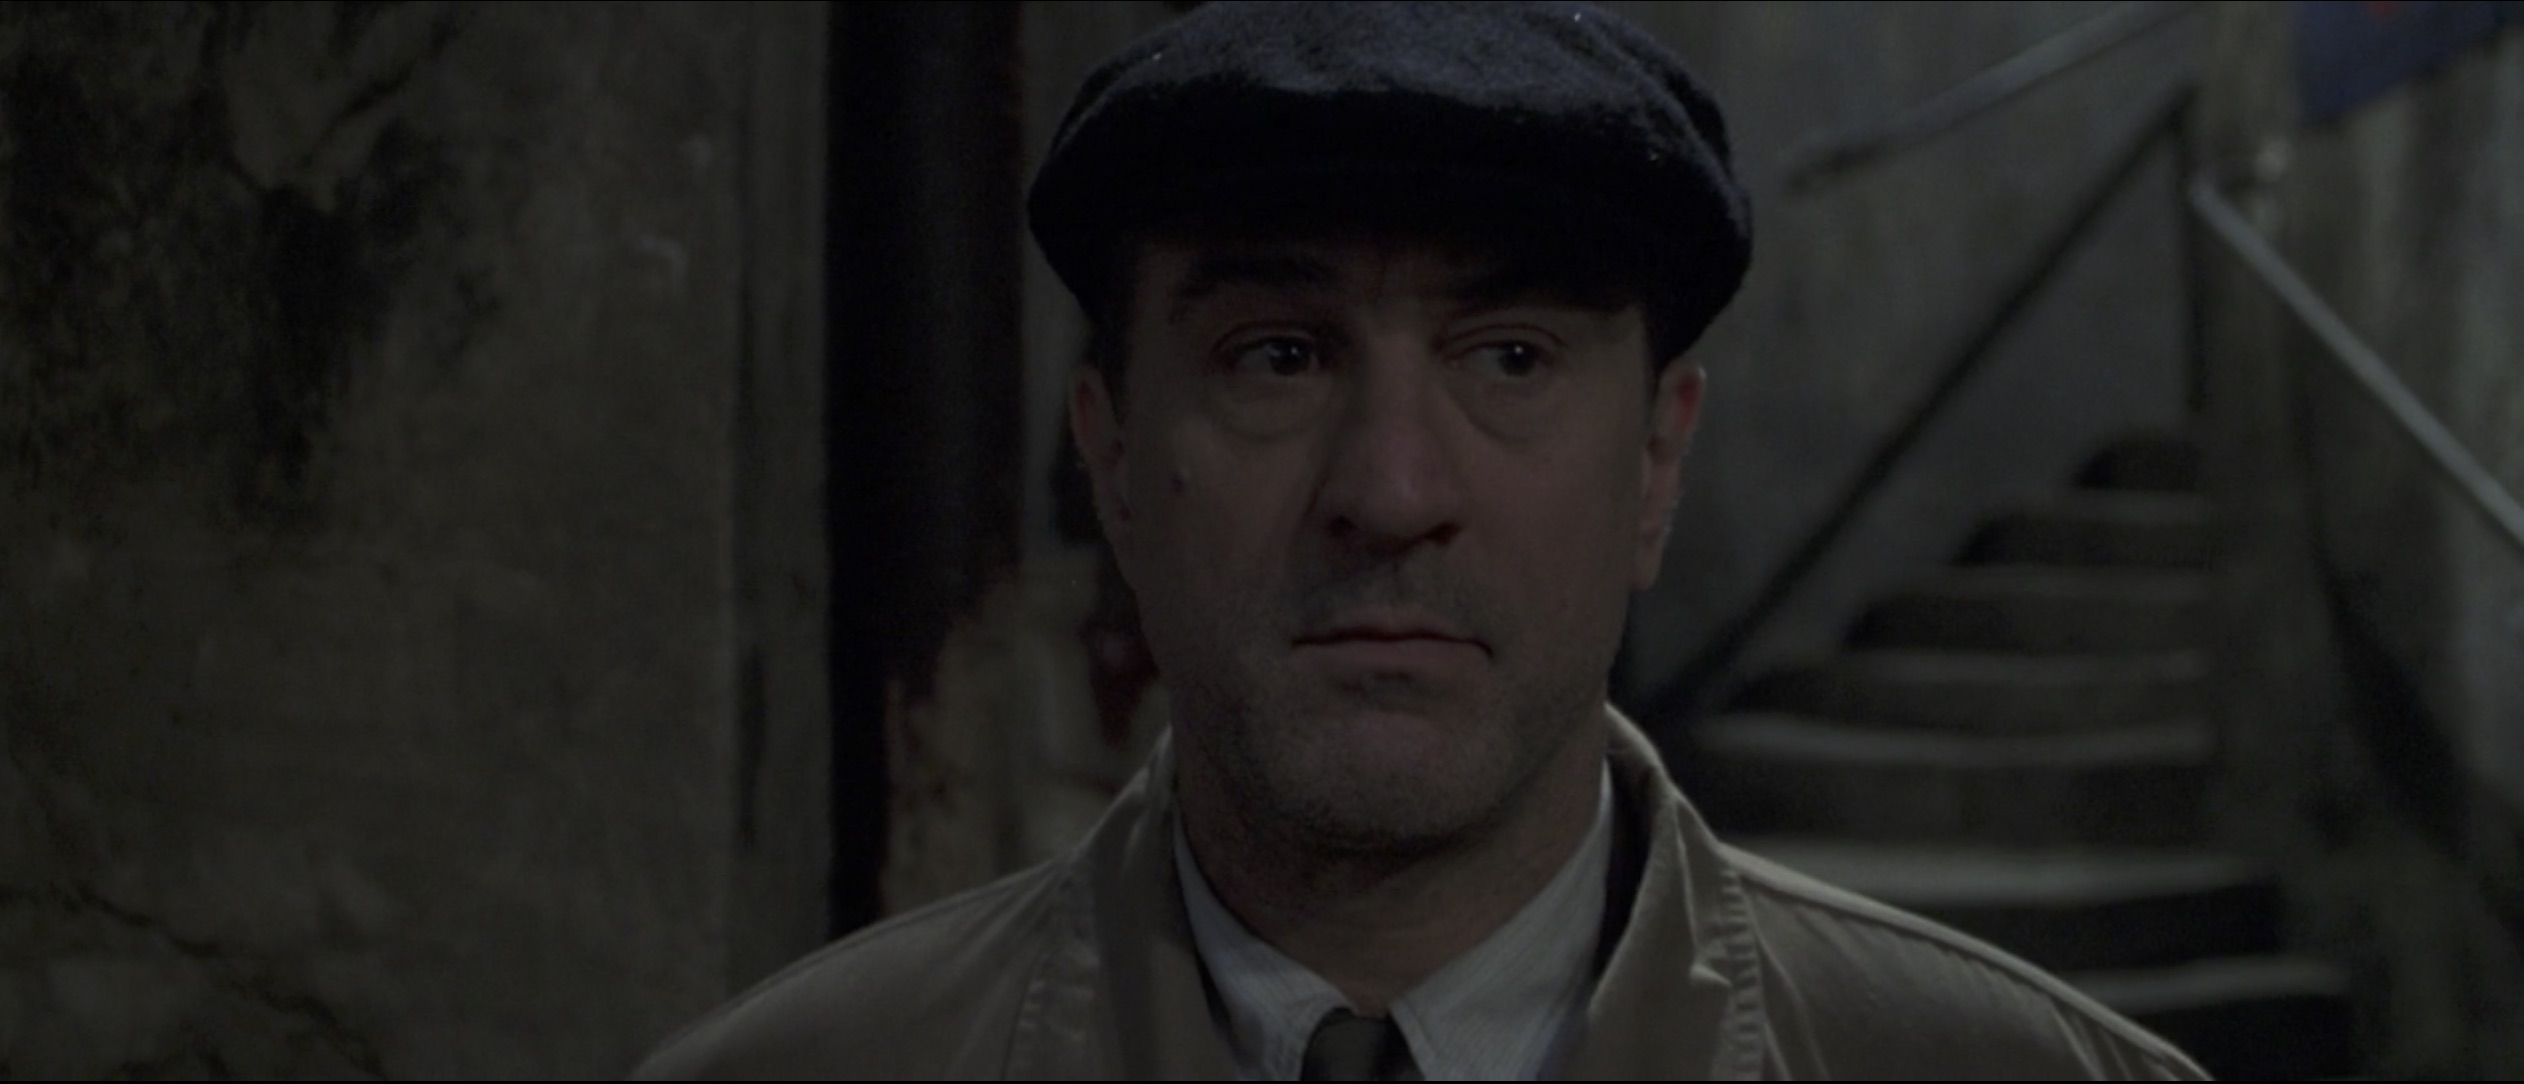 Ronin Robert De Niro